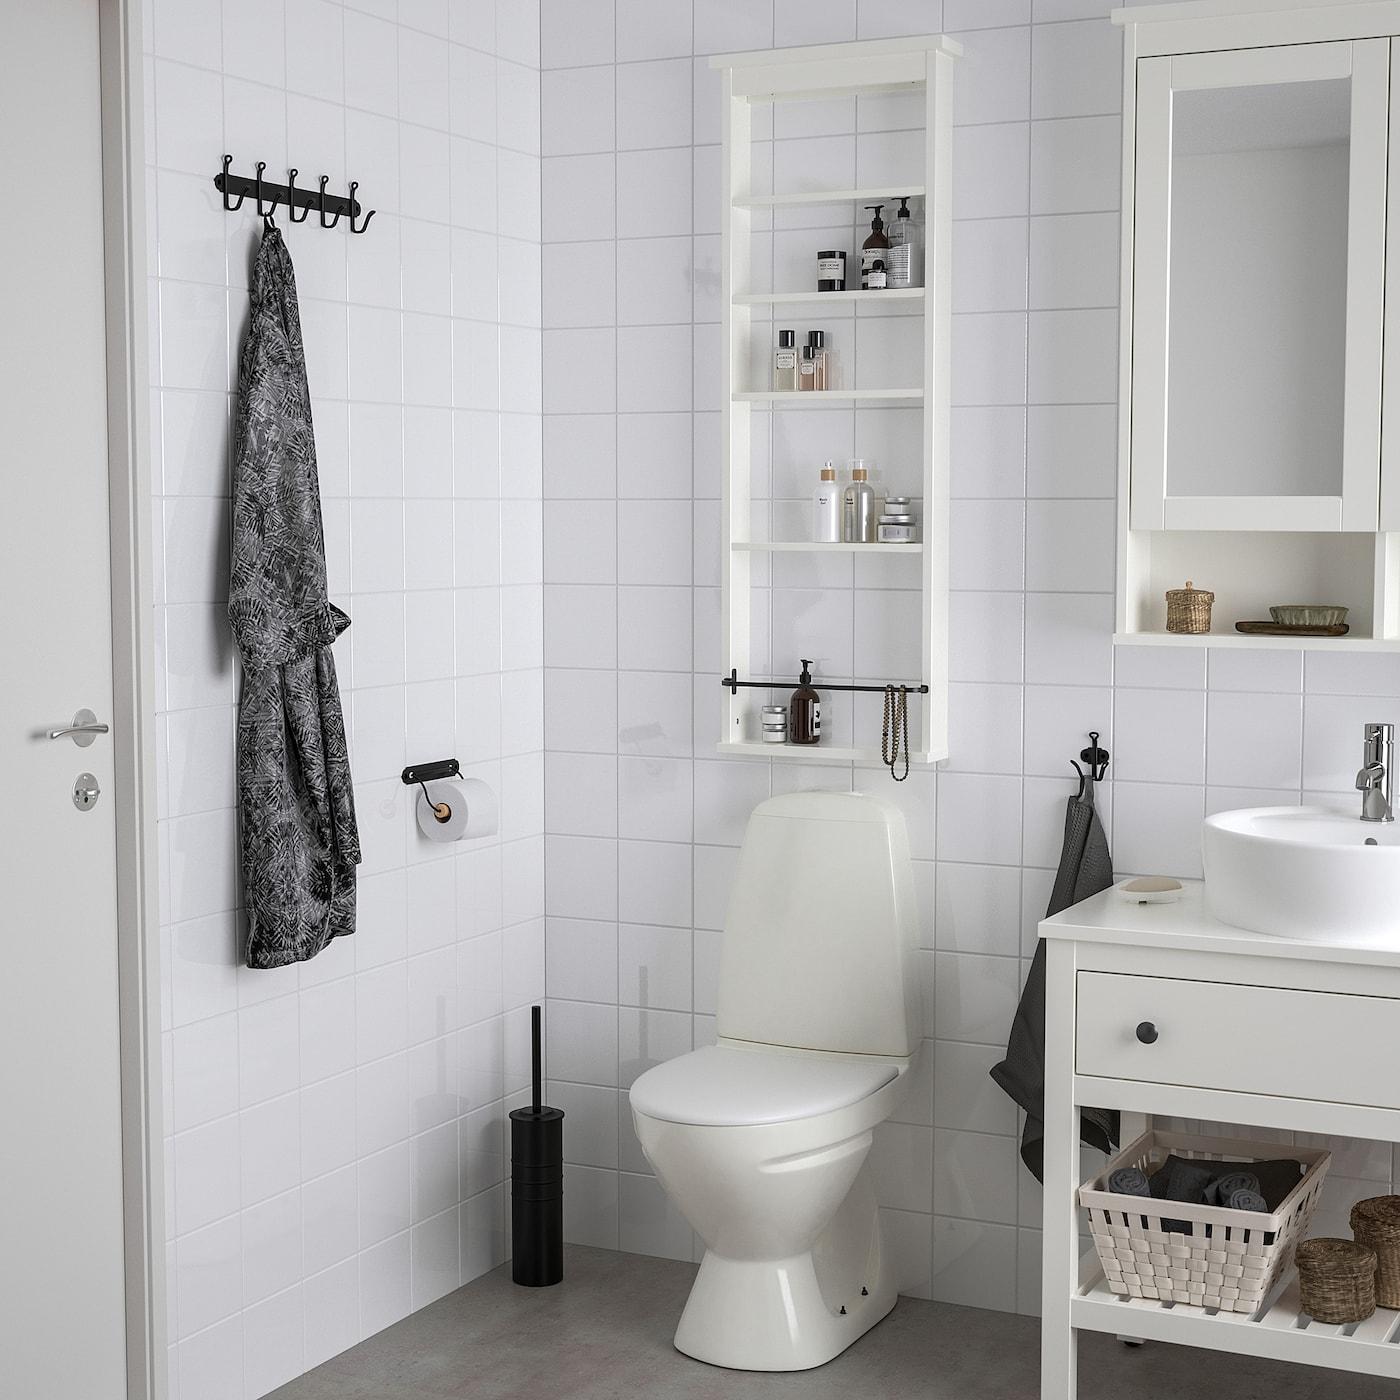 Hemnes Wall Shelf White 16 1 2x46 1 2 Ikea